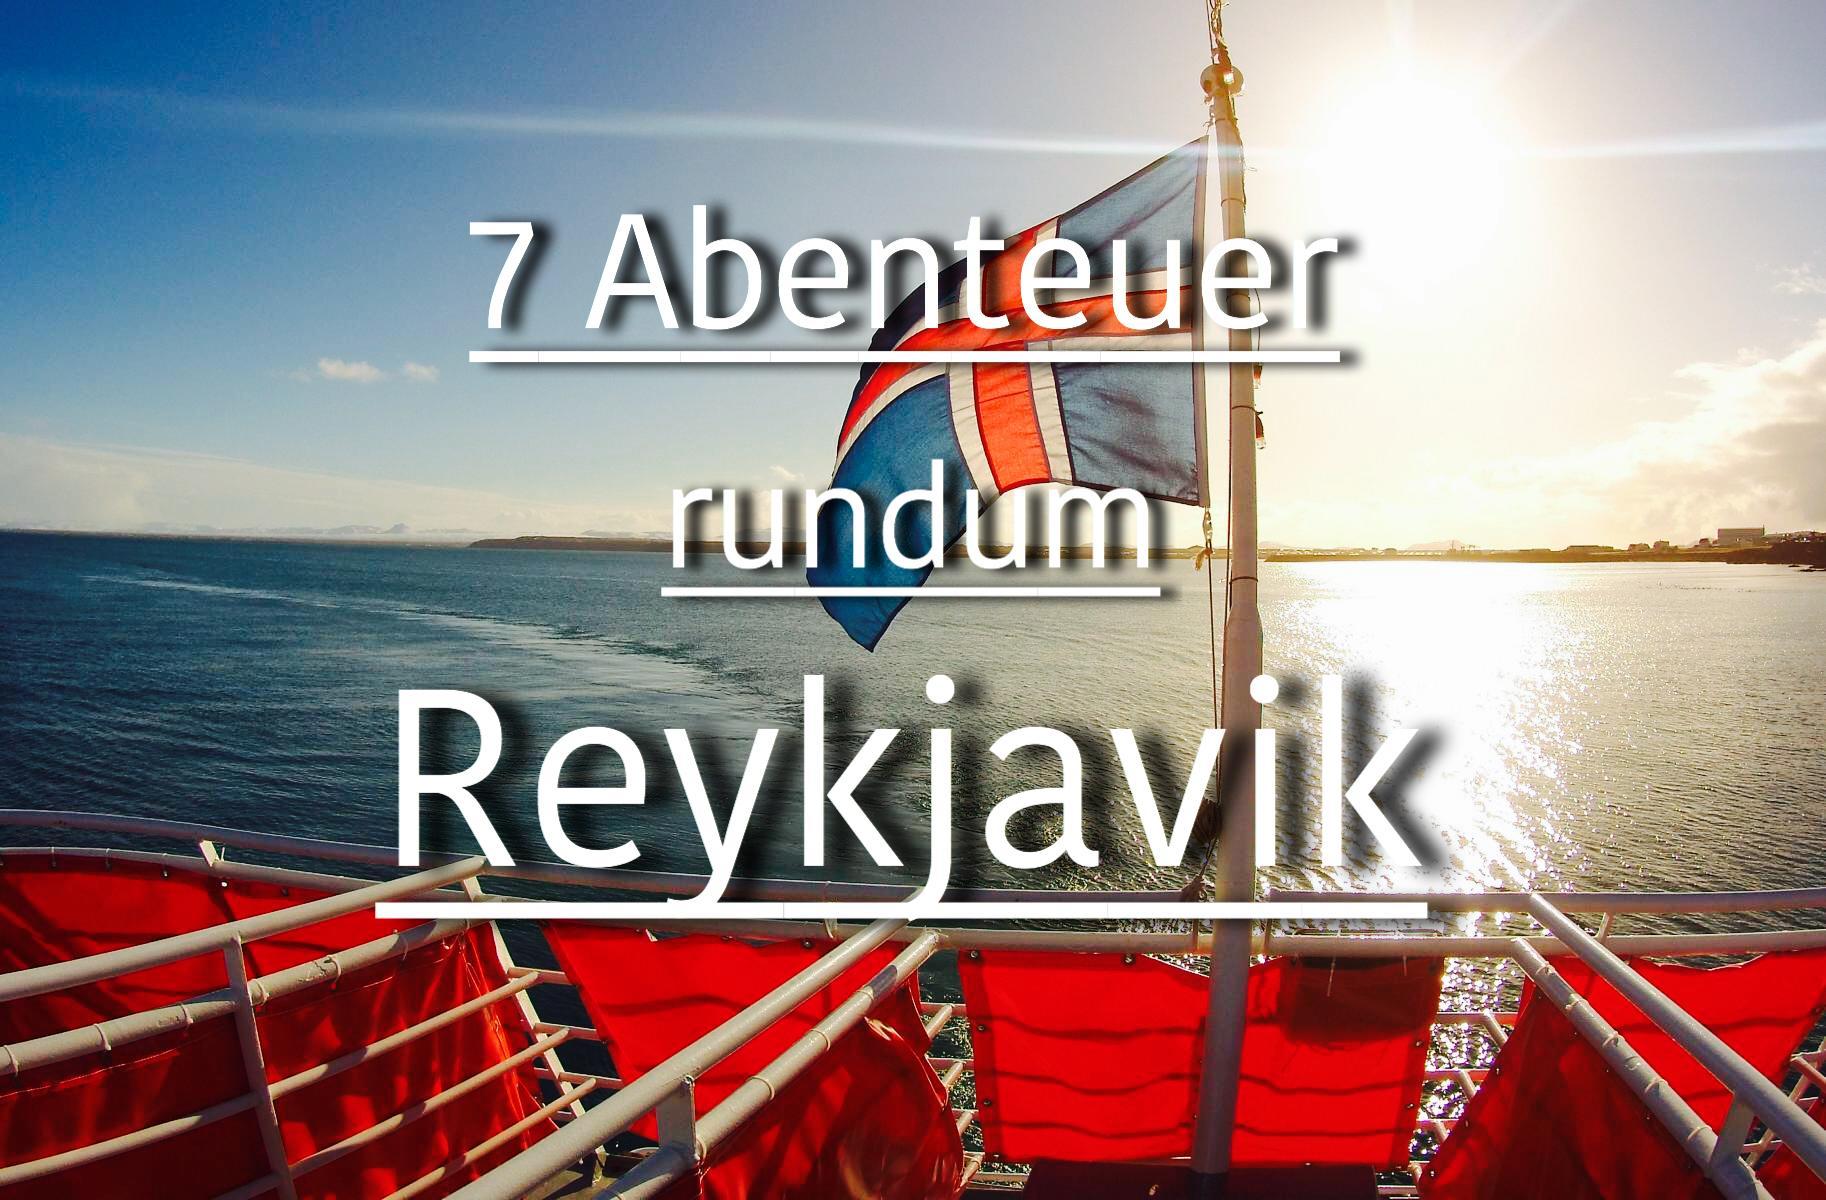 7 Highlights in Reykjavik Island